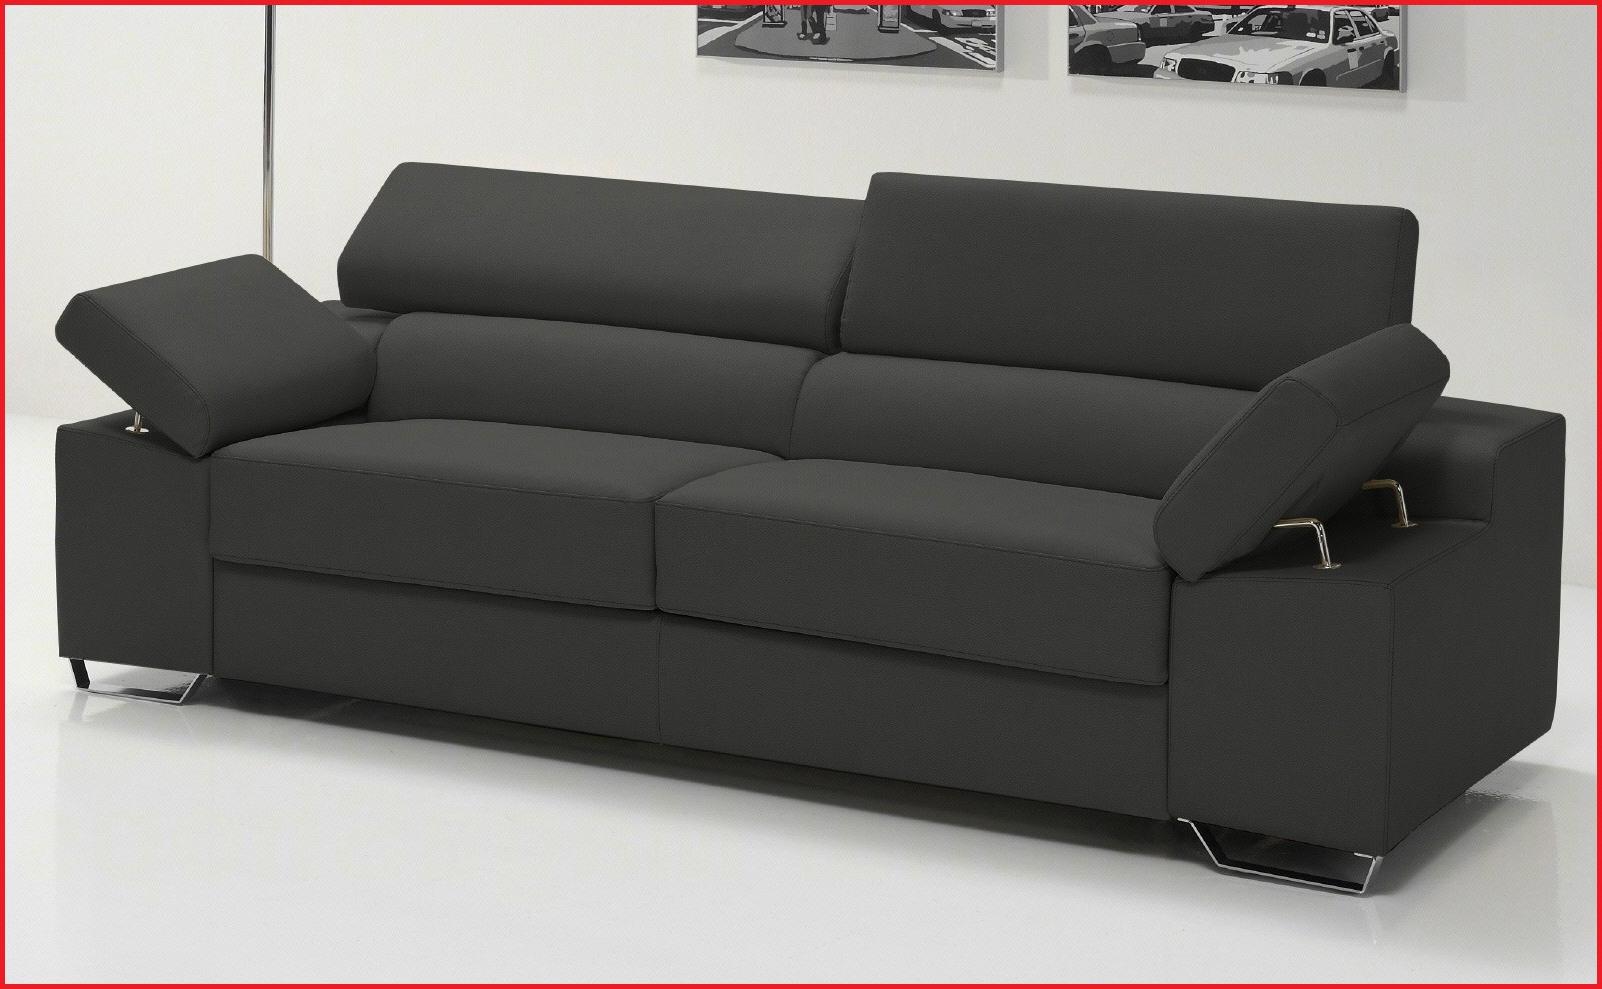 Sofa Cama Italiano Ikea E9dx Bello sofas Precios sofa Cama Baratos Ikea Camas